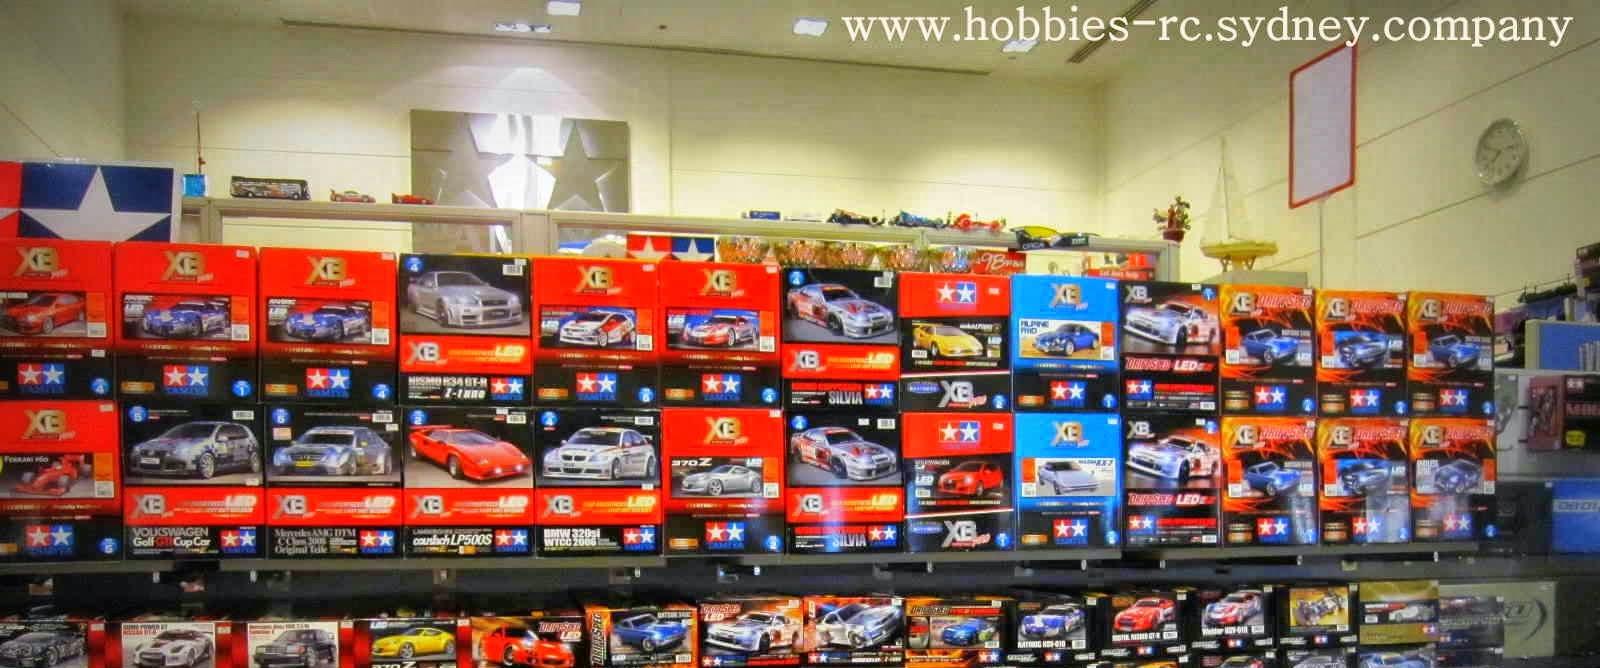 Hobby Rc Shops Near Me >> Rc Car Shops. Muscle Car Shop, Map For Car Shop, Big Car Shop, Auto Car Shop, Nice Car Shop ...